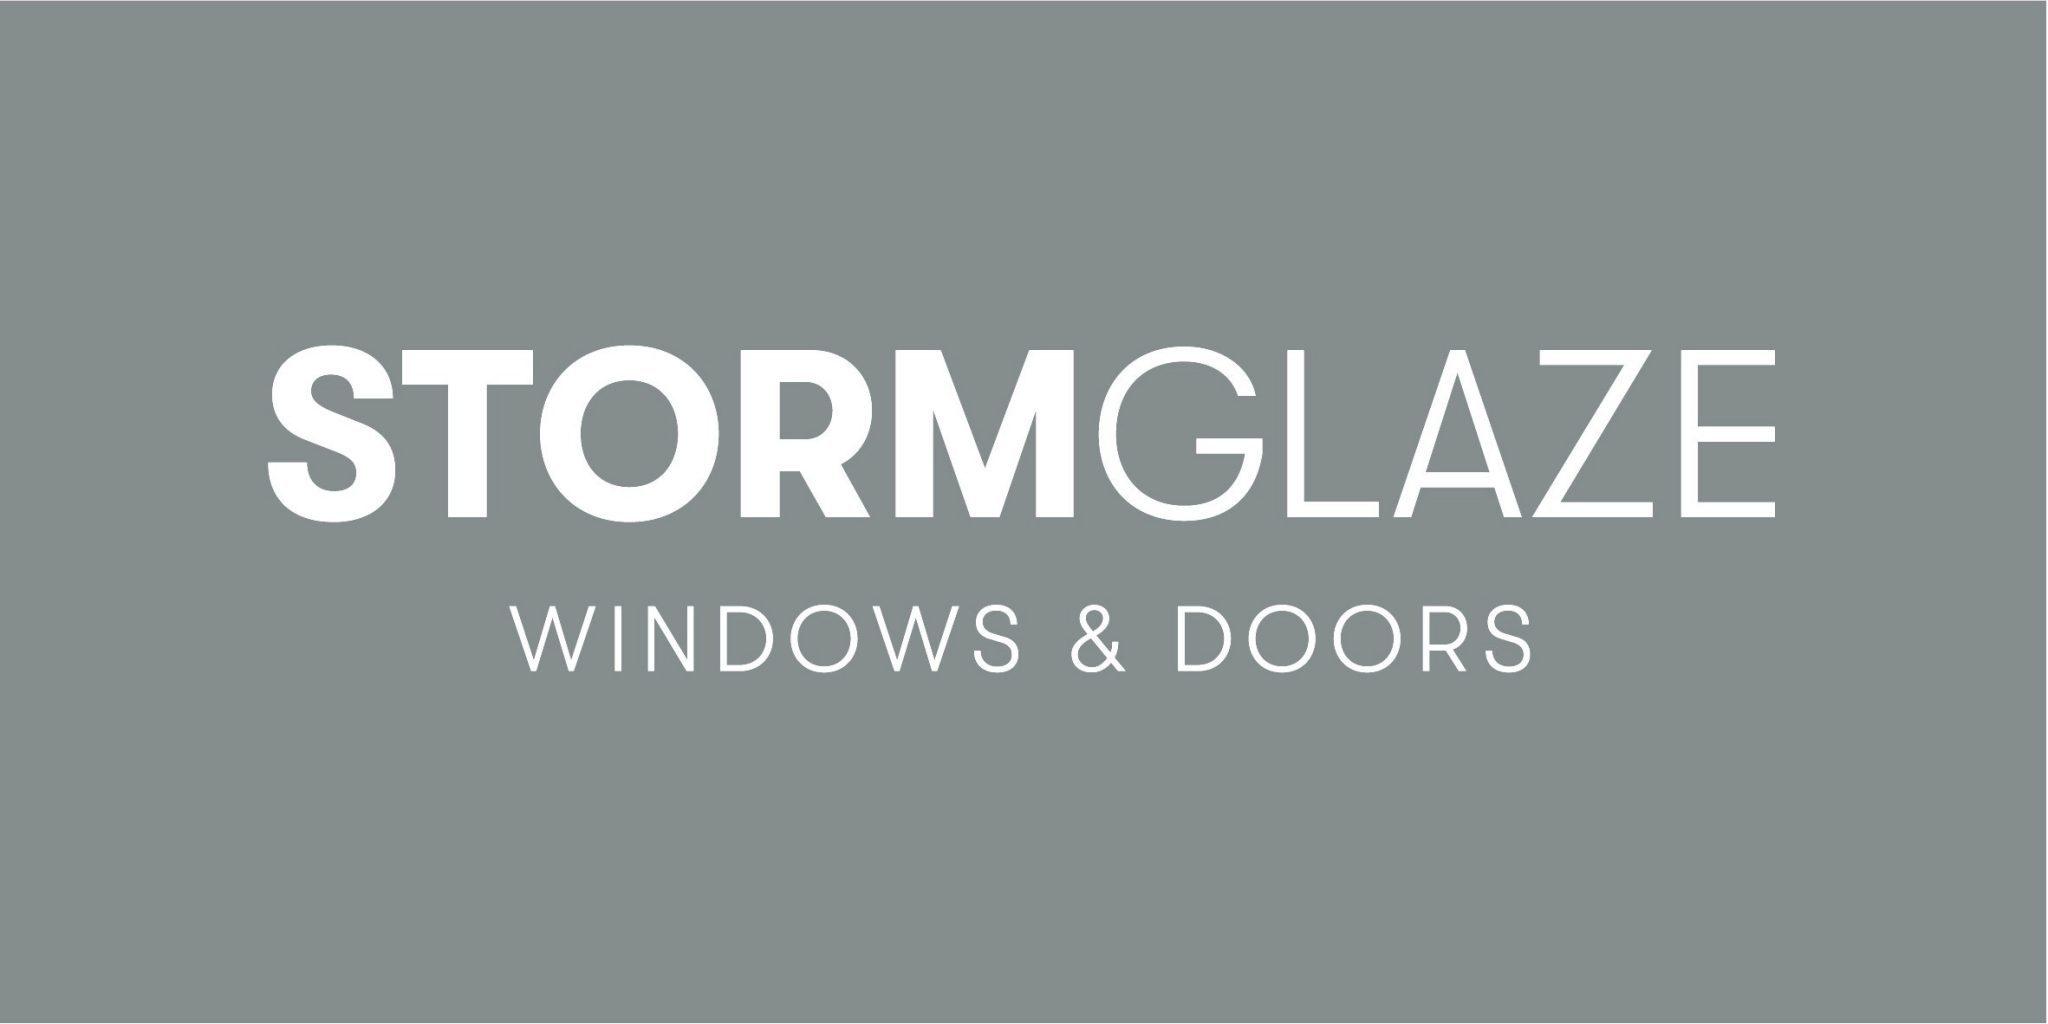 Stormglaze Windows & Doors Logo